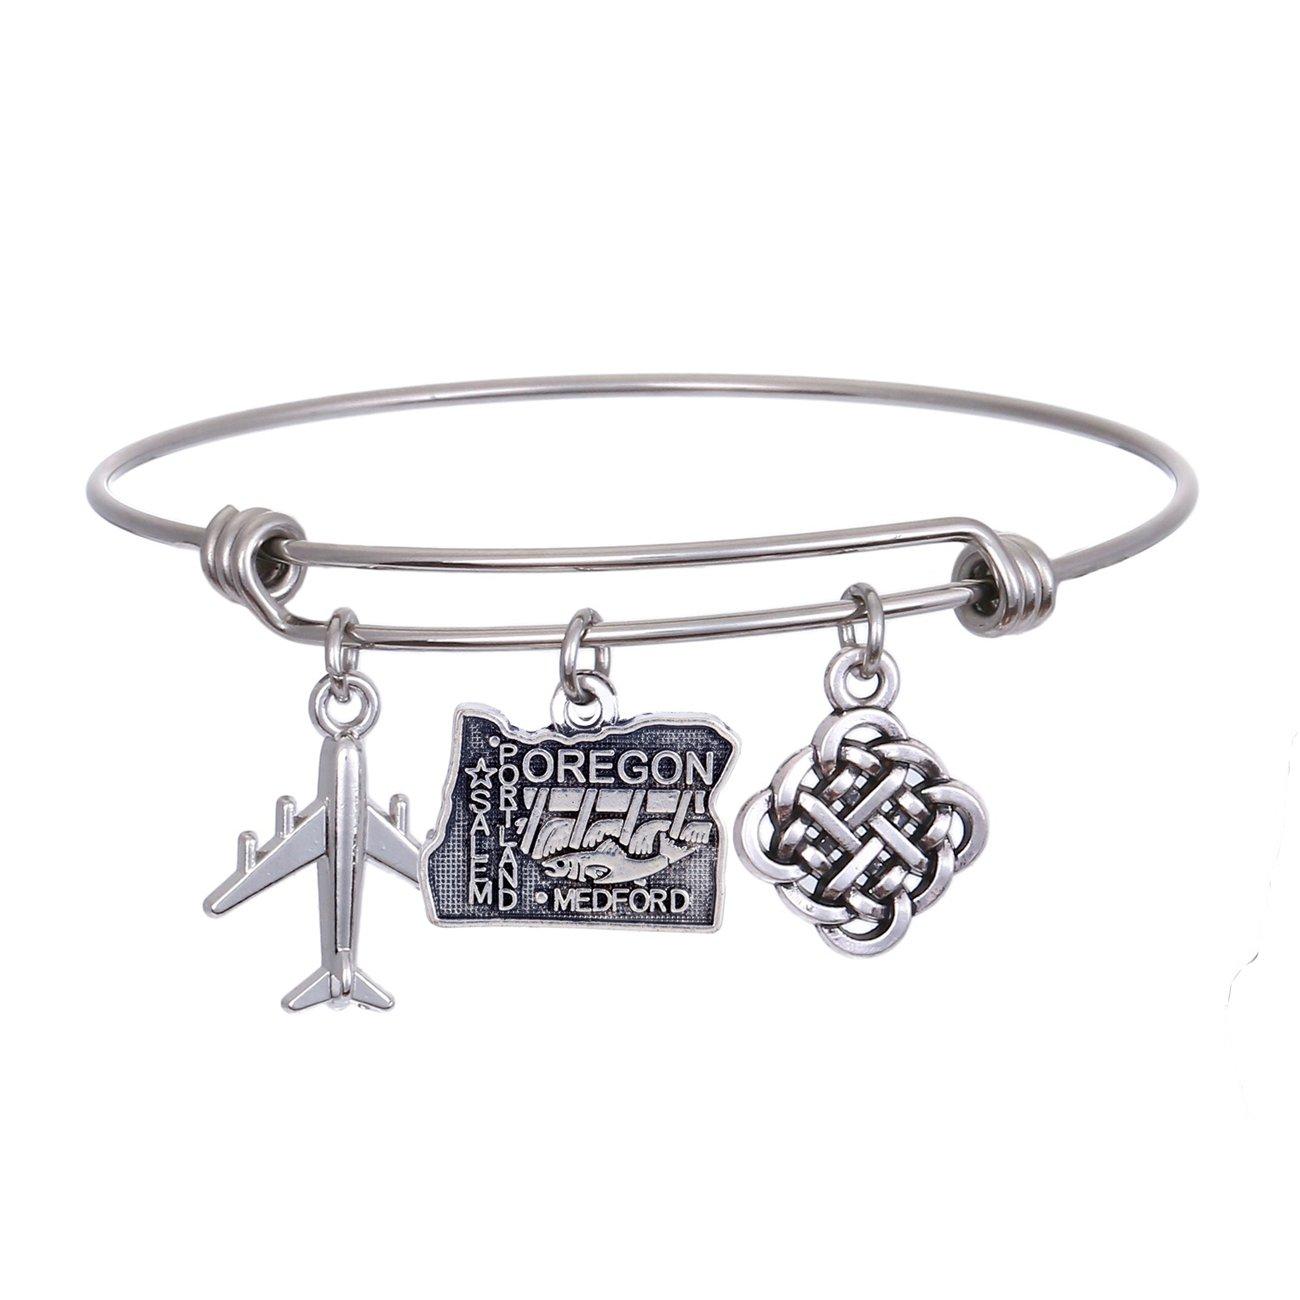 JJTZX State Bangle U.S. Map Charm Expandable Travel Bracelet Long Distance Relationship Gift Best Friends Bracelet (Oregon)